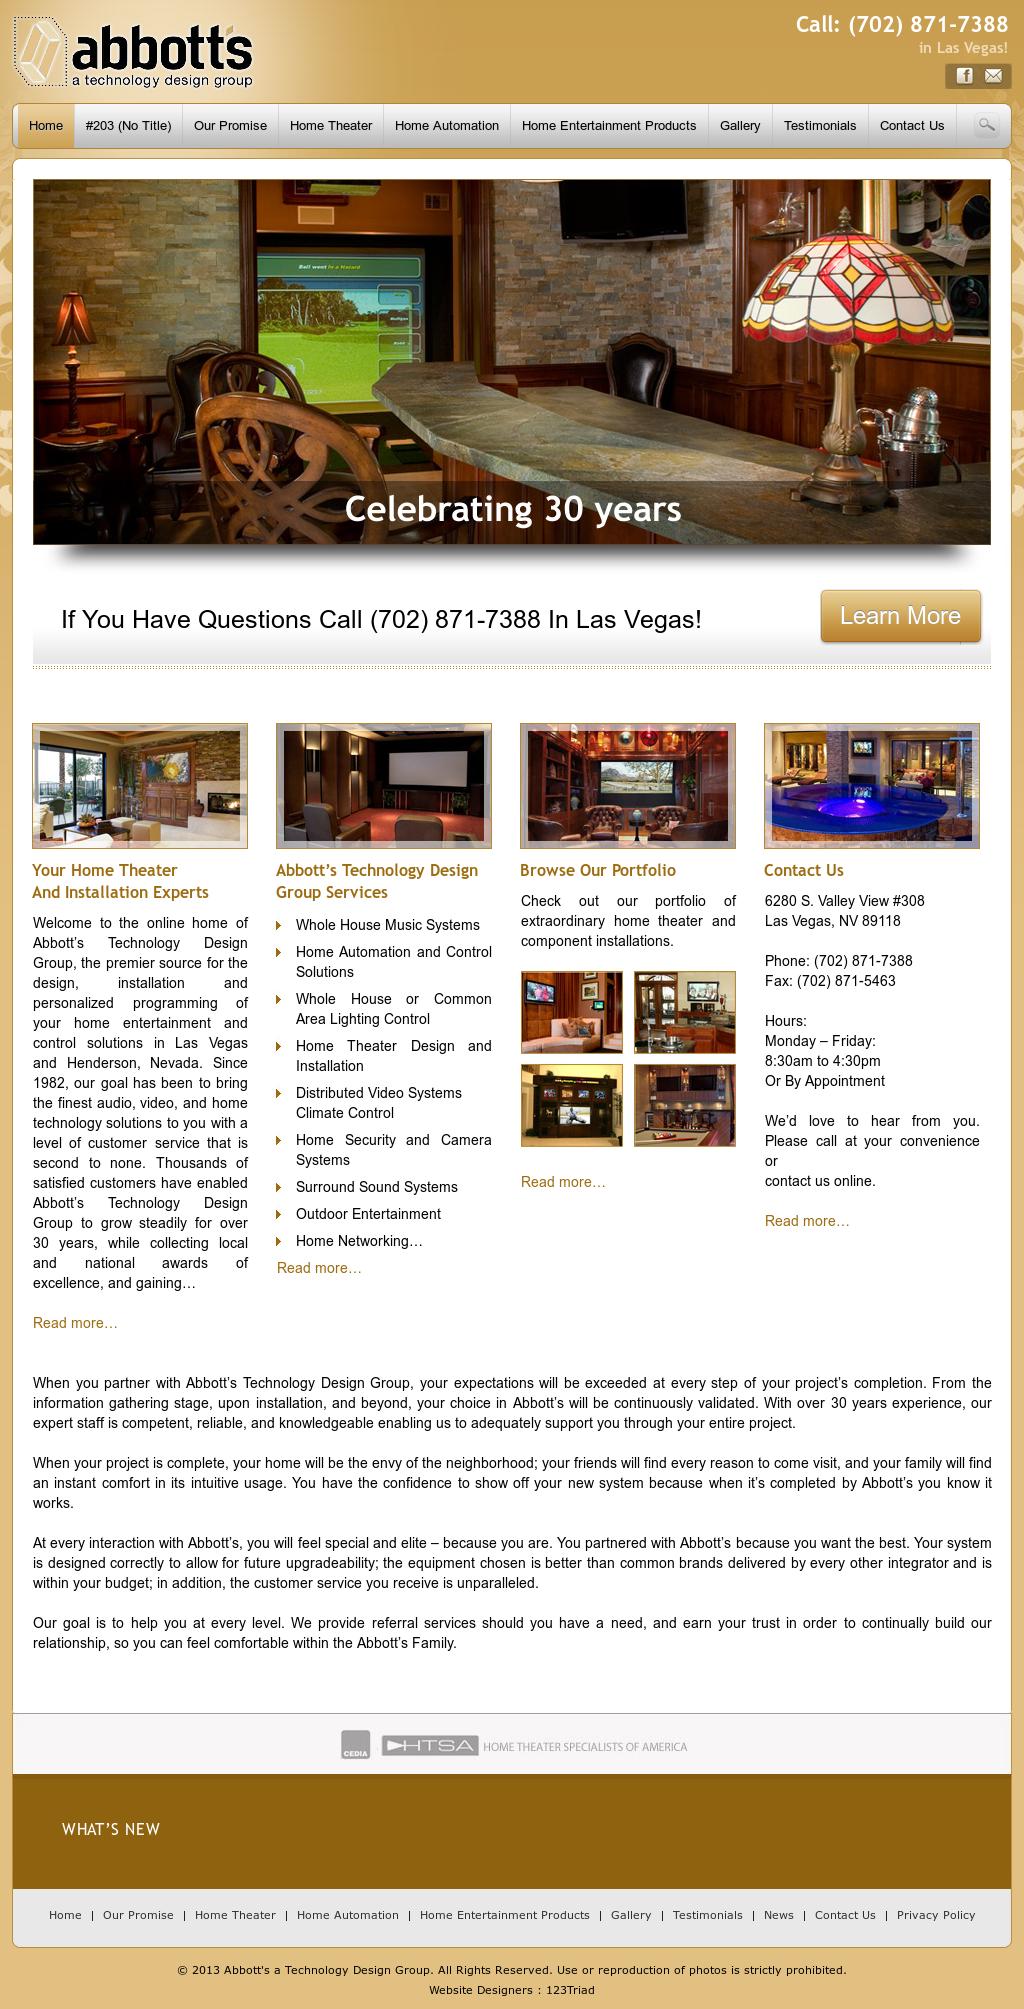 Abbottstdg Competitors, Revenue and Employees - Owler Company Profile